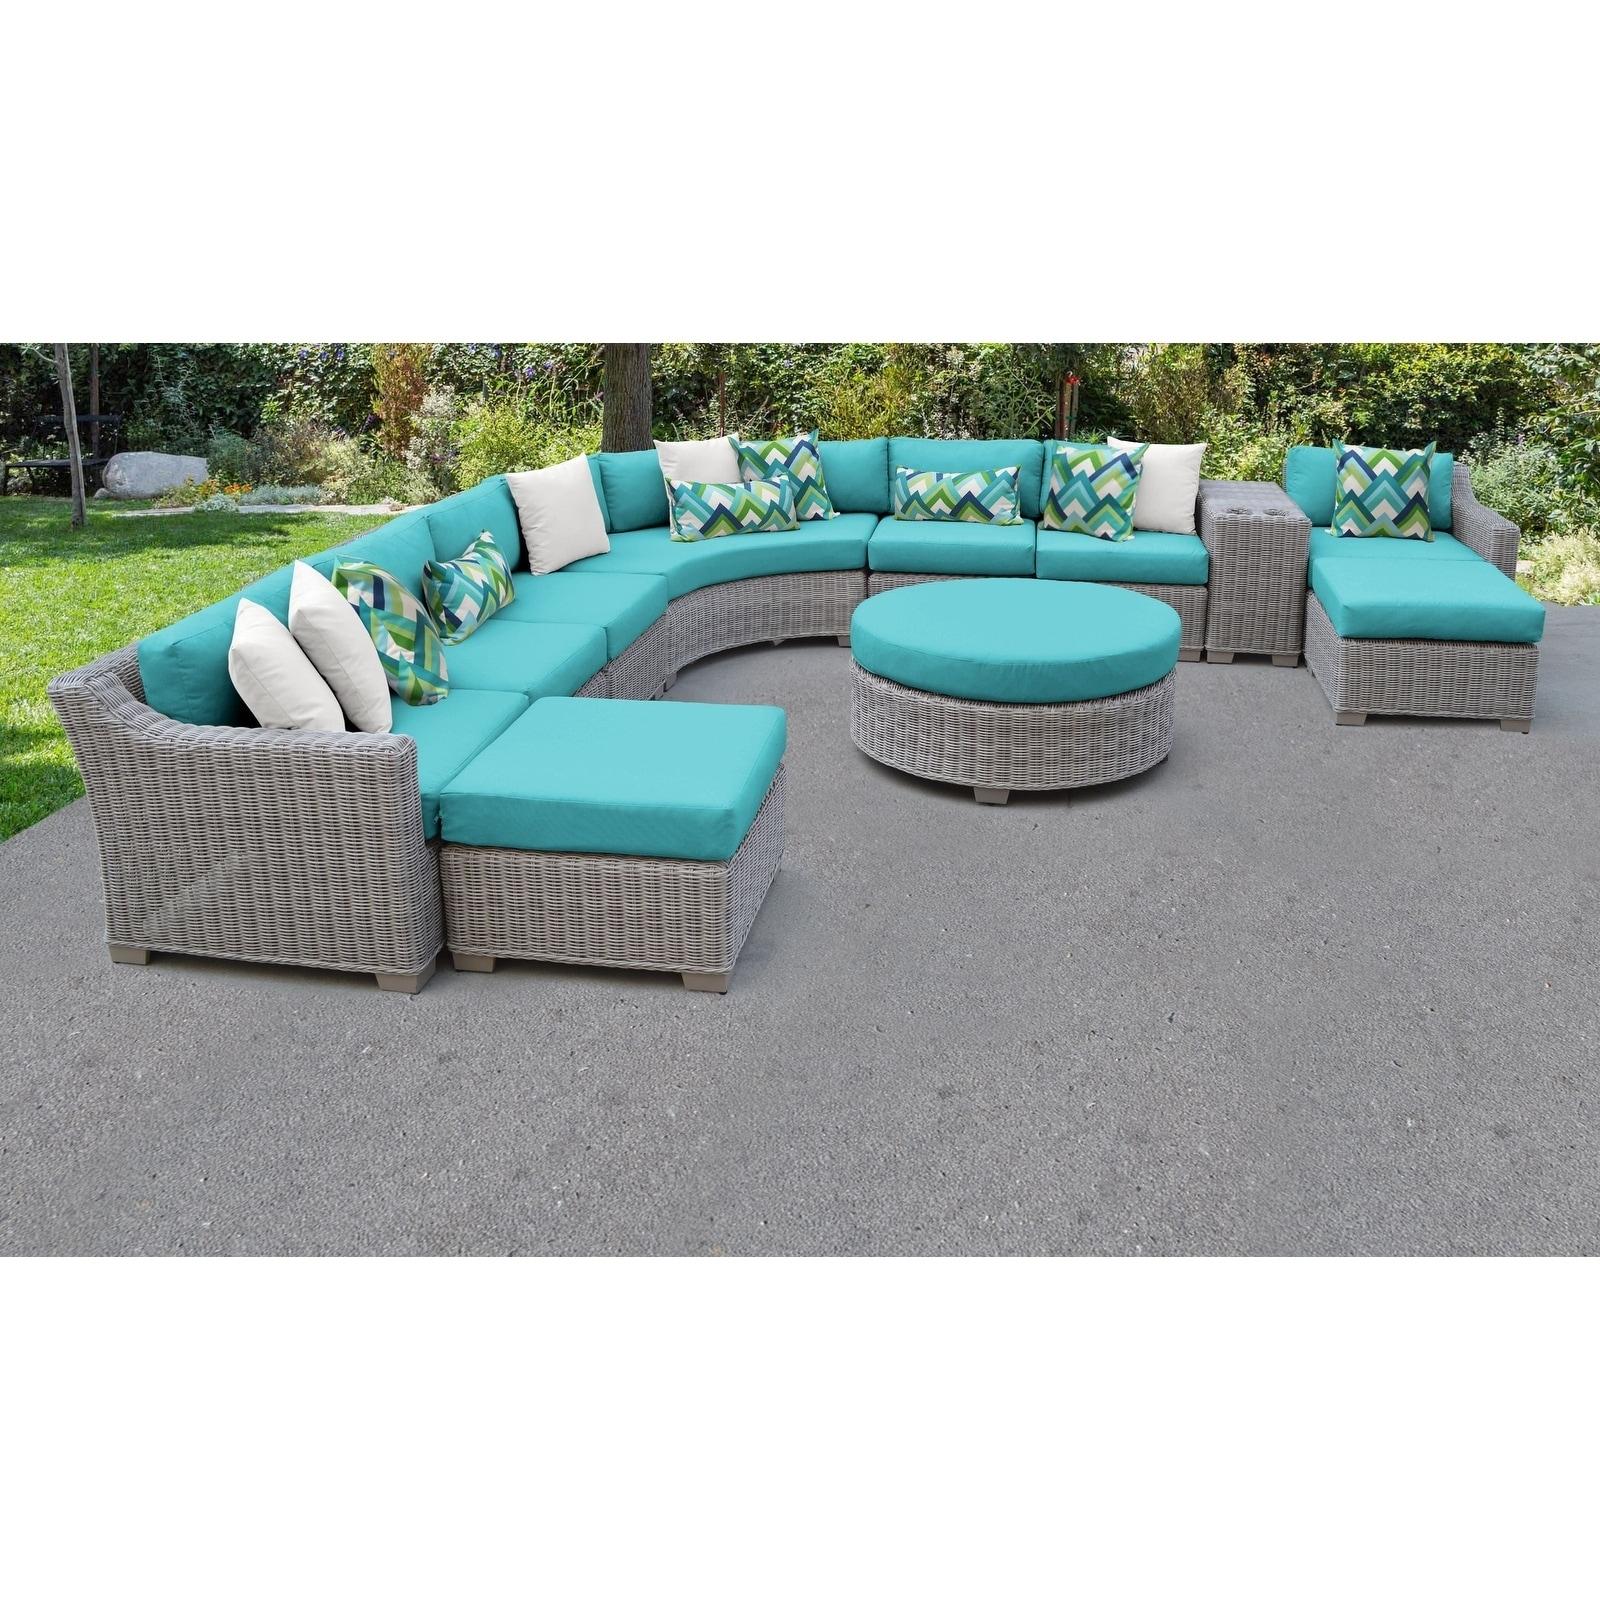 Coast 11 Piece Outdoor Wicker Patio Furniture Set